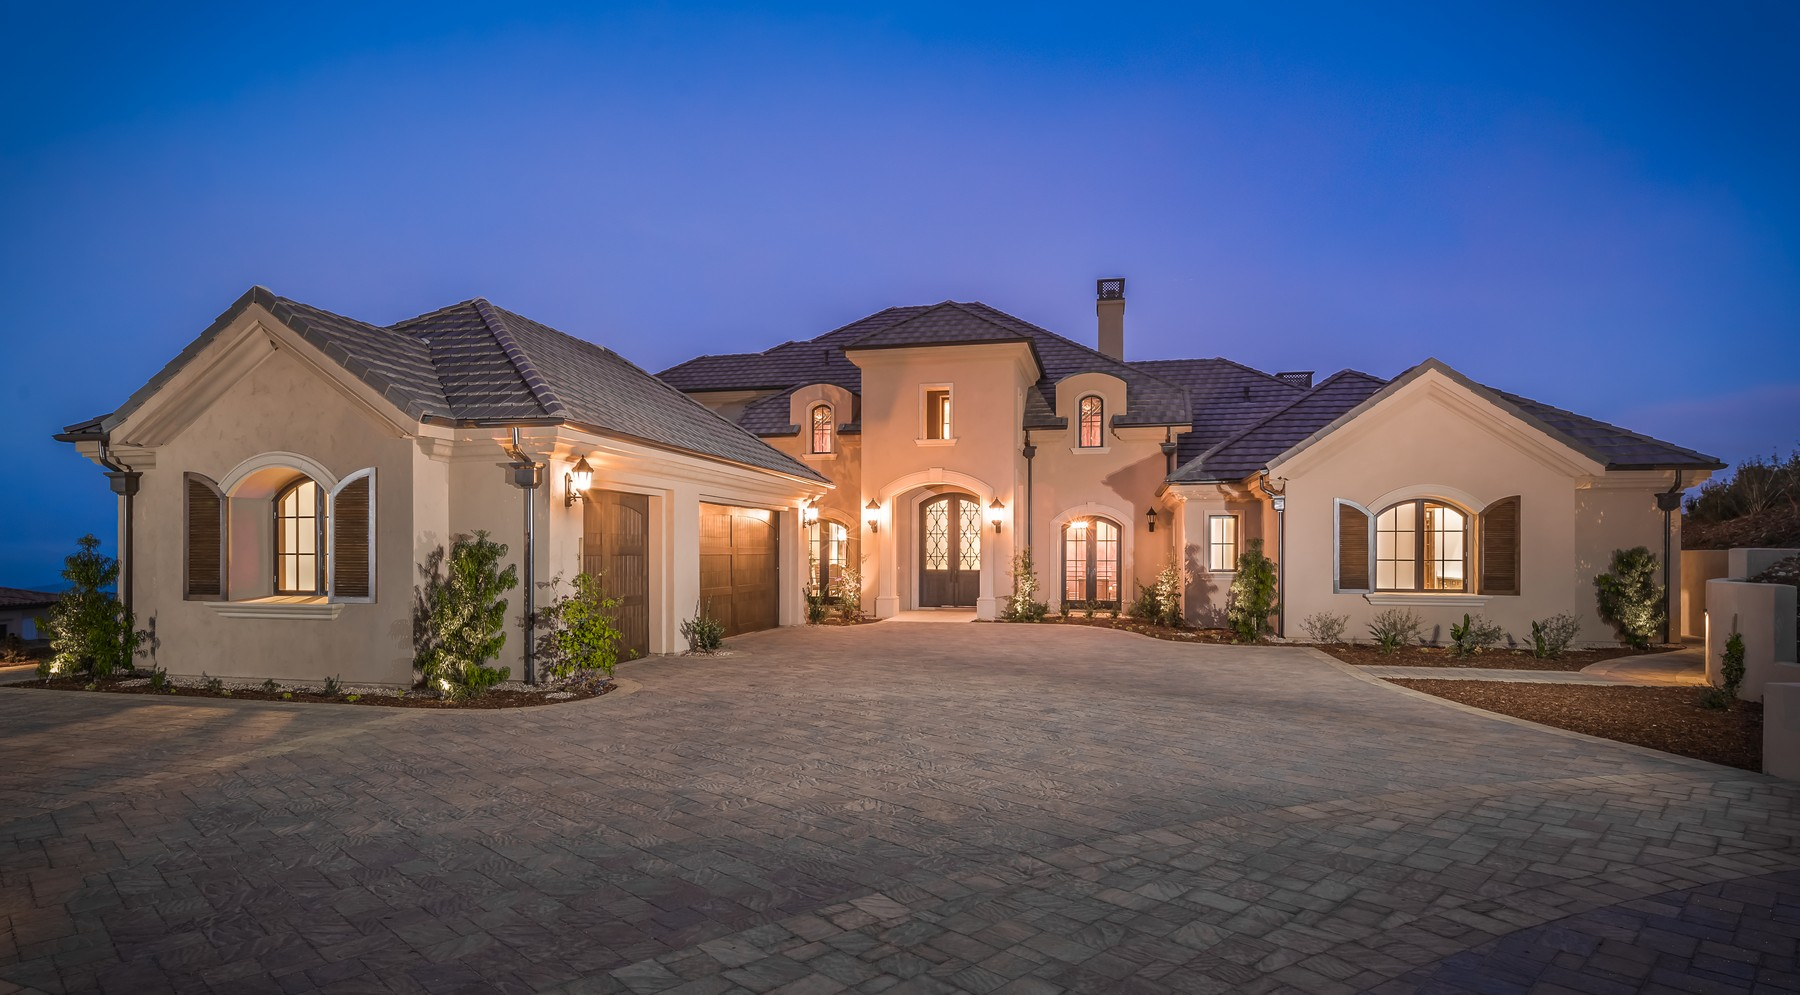 Single Family Home for Sale at 18346 Avenida Apice Rancho Santa Fe, California 92067 United States